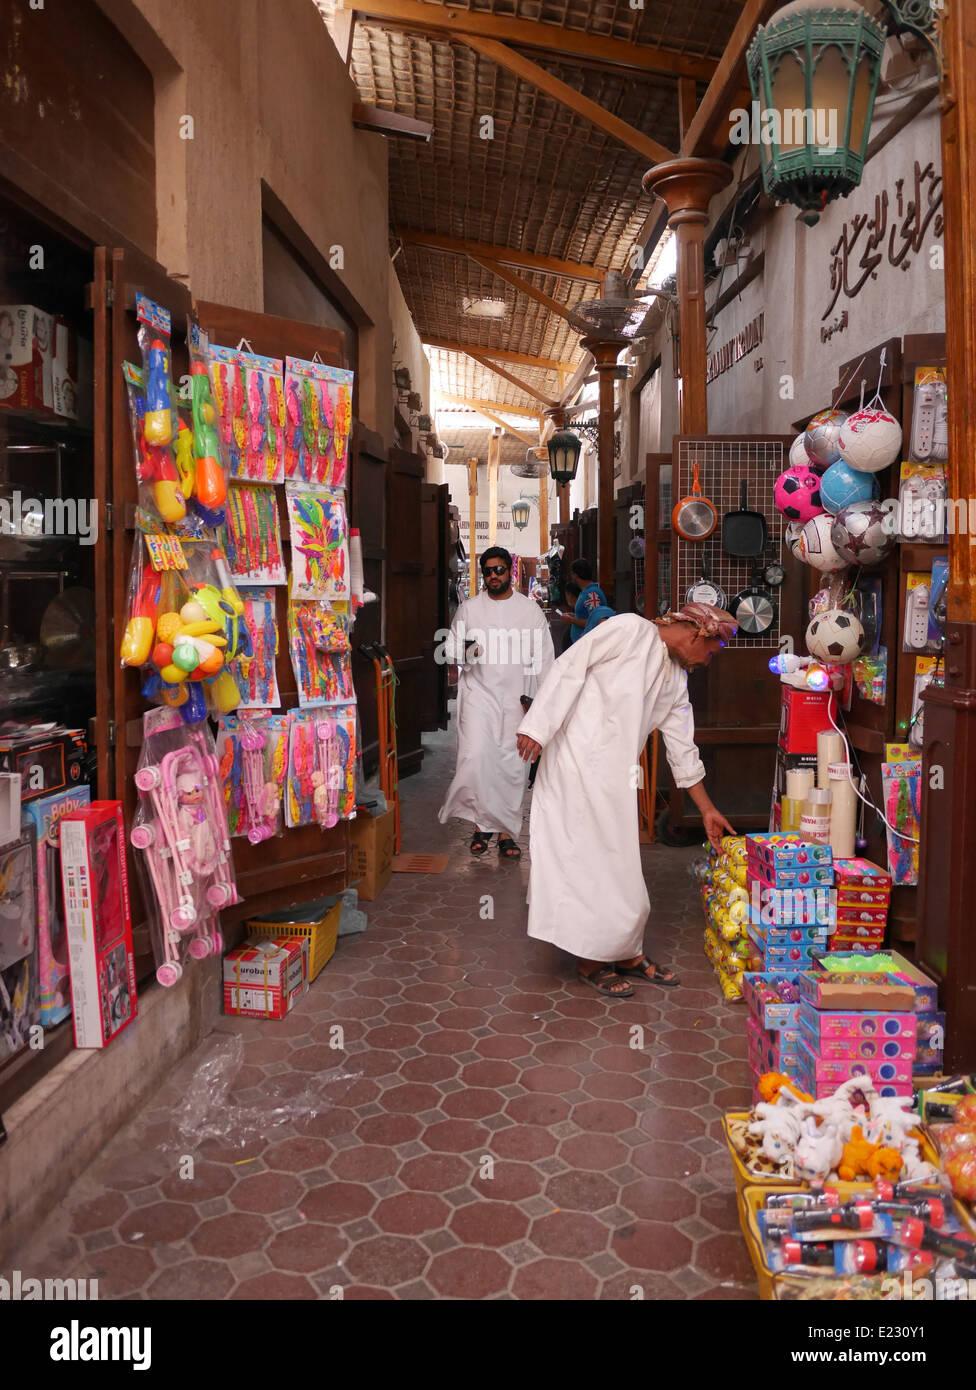 Grand Souq Diera Dubai Stock Photo: 70137397 - Alamy